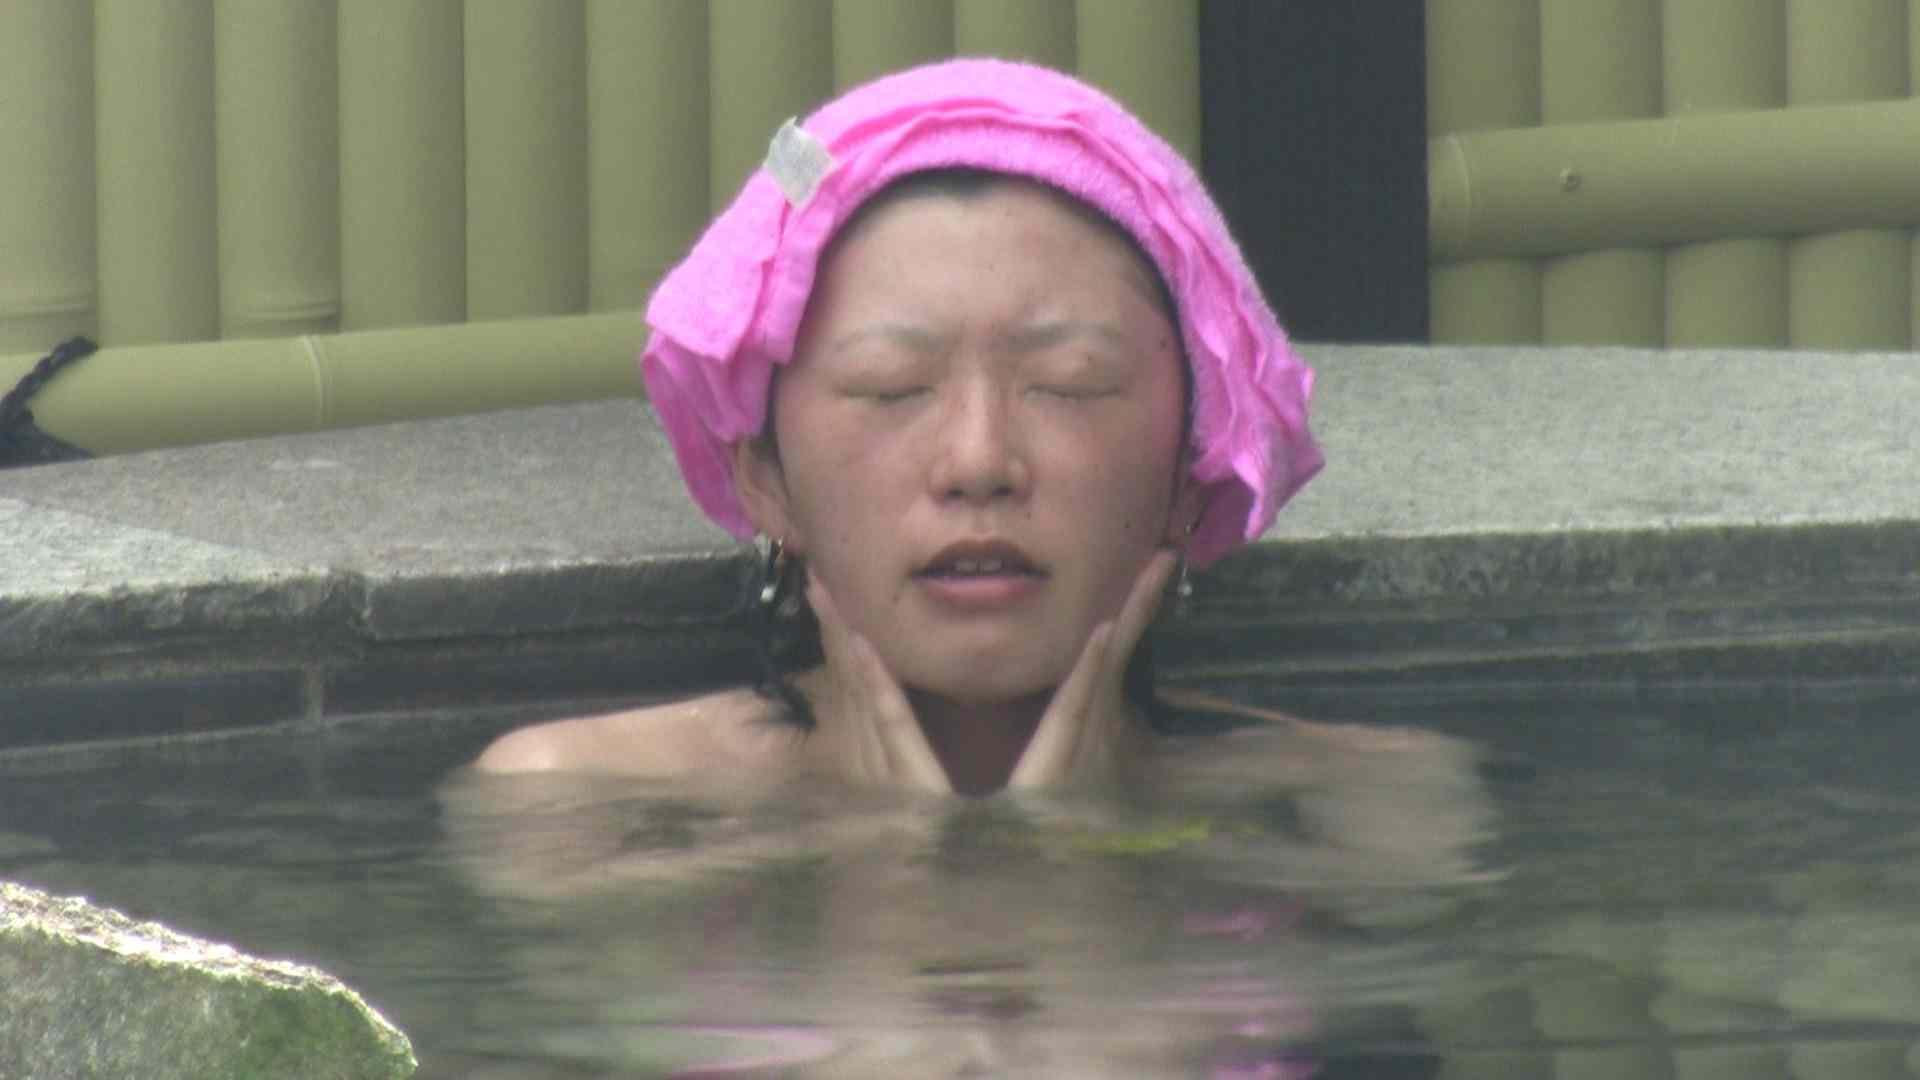 Aquaな露天風呂Vol.127 盗撮師作品 | 露天風呂突入  77pic 34